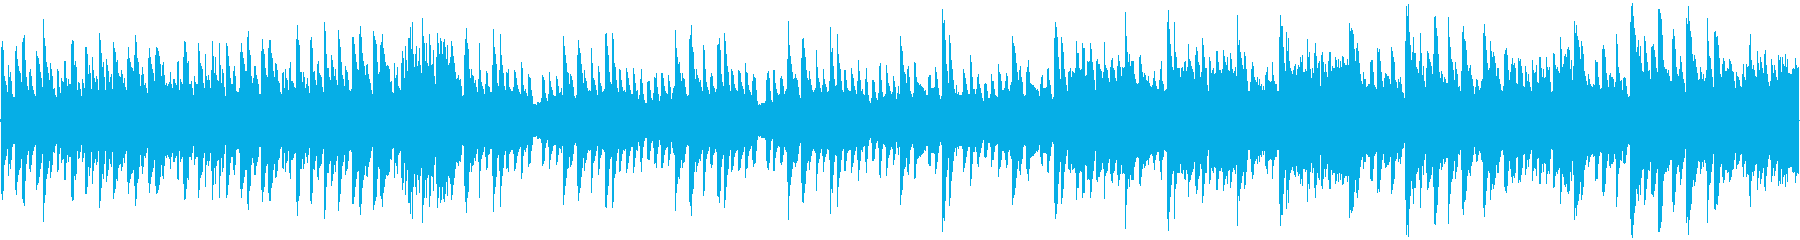 8bit ポップに爽快な宇宙 ループ音源の再生済みの波形